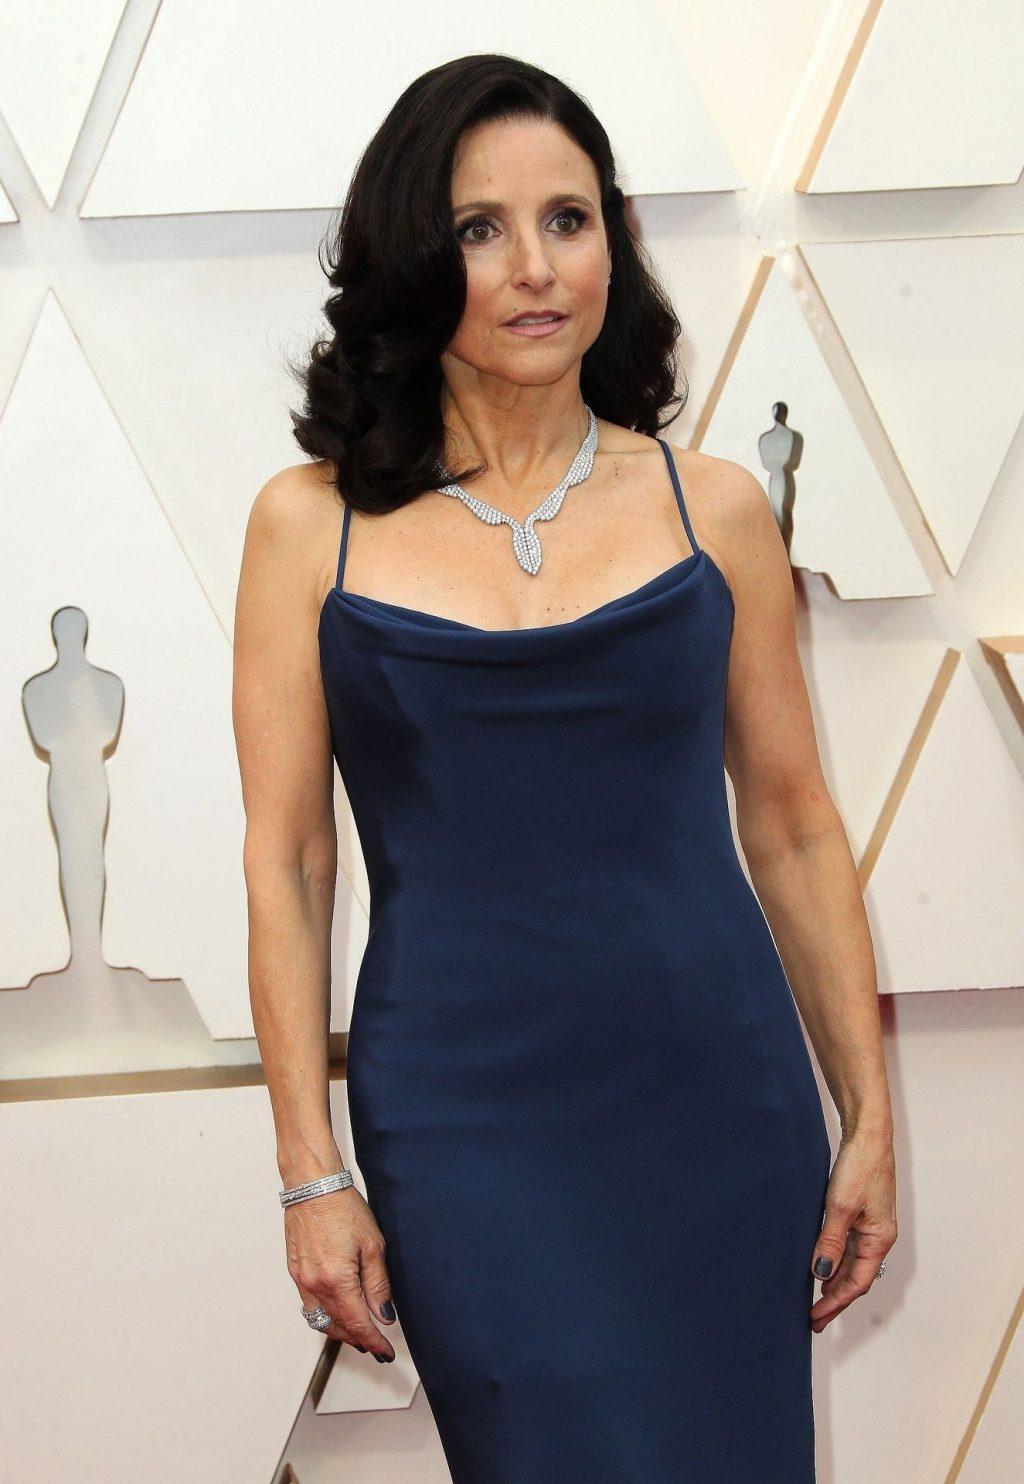 Julia Louis-Dreyfus Flaunts Her MILF Body at the 2020 Academy Awards (53 Photos)